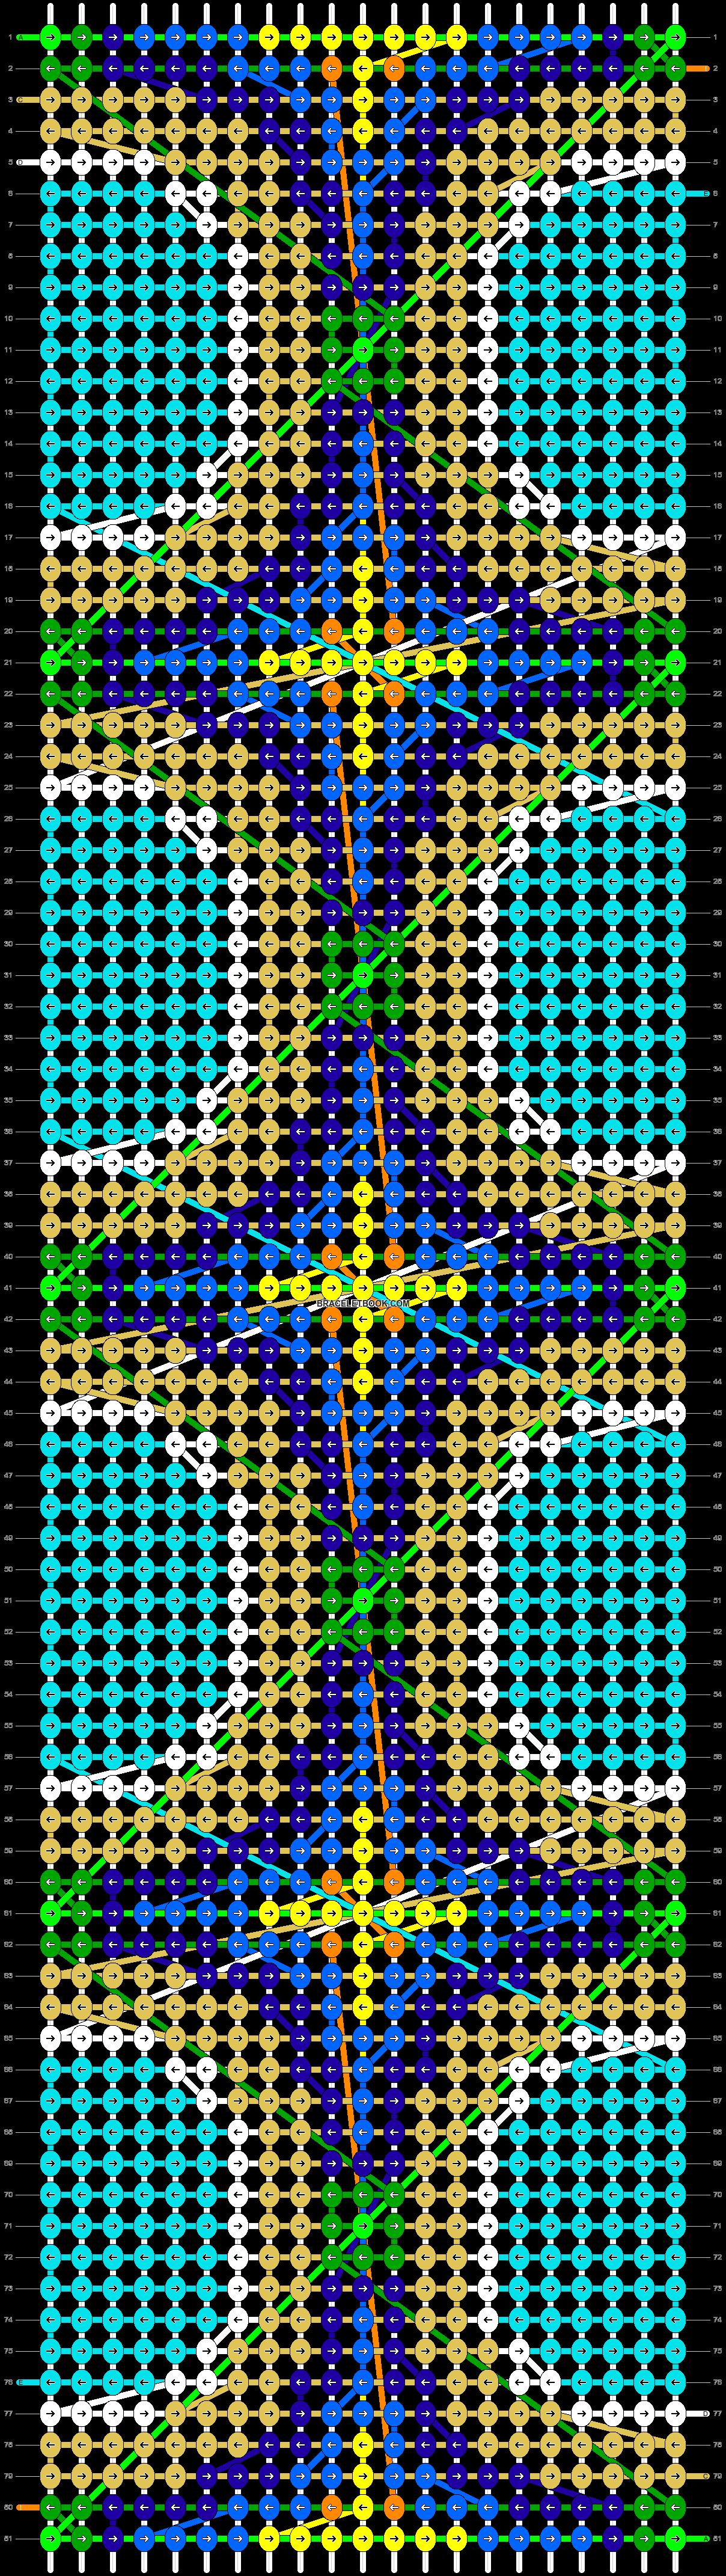 Alpha Pattern #22715 added by JCat2018